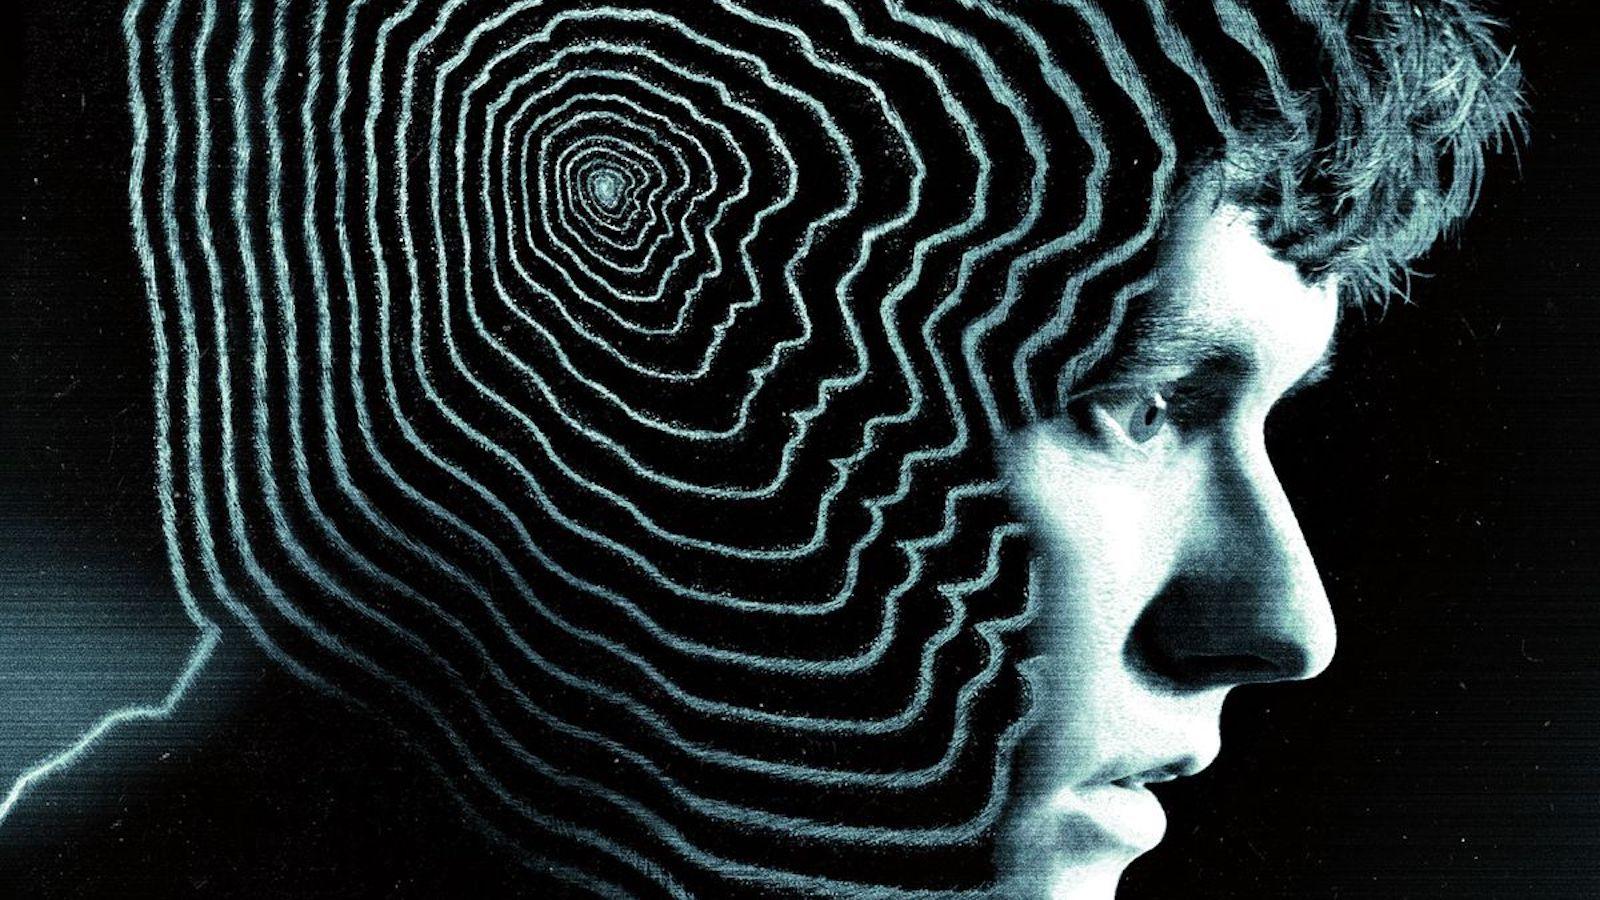 Black Mirror's Bandersnatch image from Netflix.